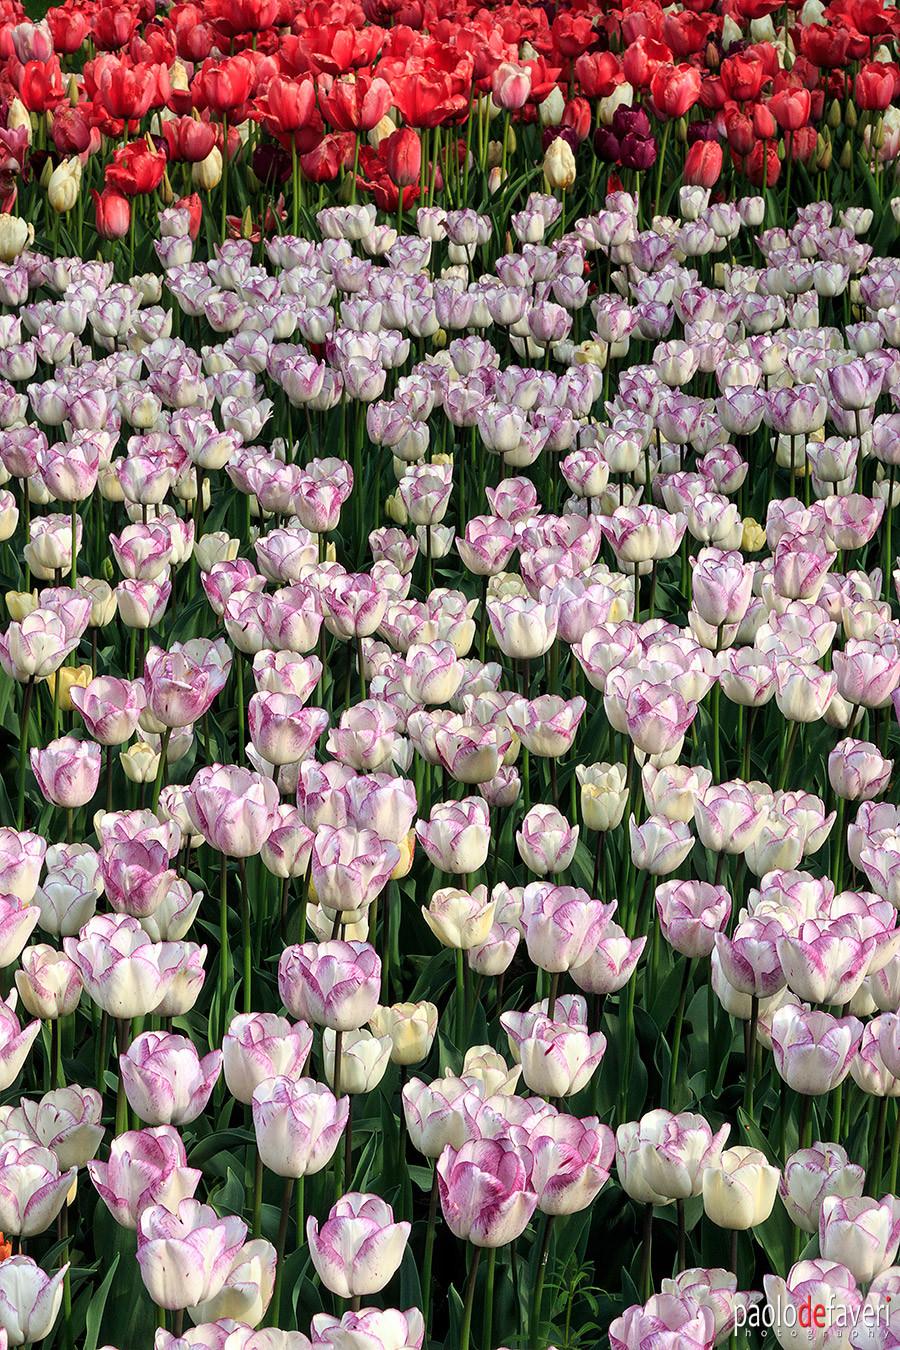 Pralormo Castle Turin Italy Messer Tulipano Tulip Flowers Exhibition spring 2019